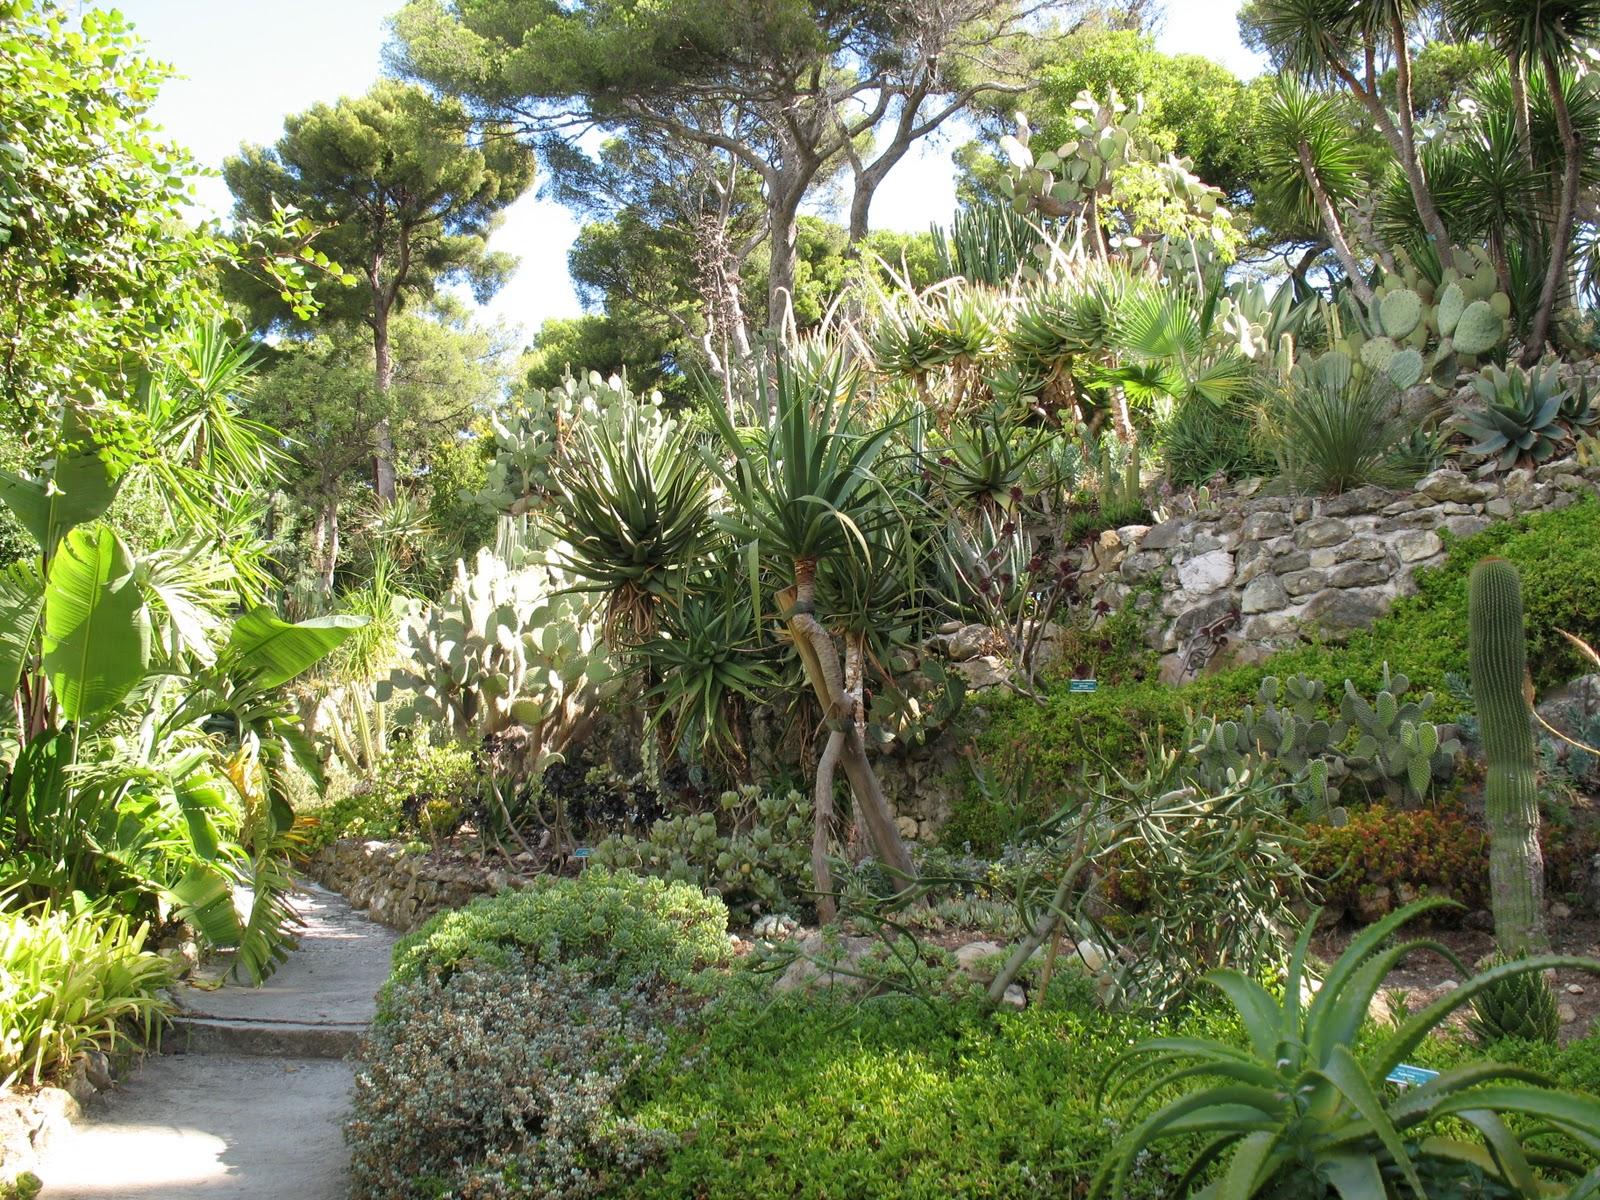 Roses du jardin ch neland villa ephrussi de rothschild - Jardin de chen ...